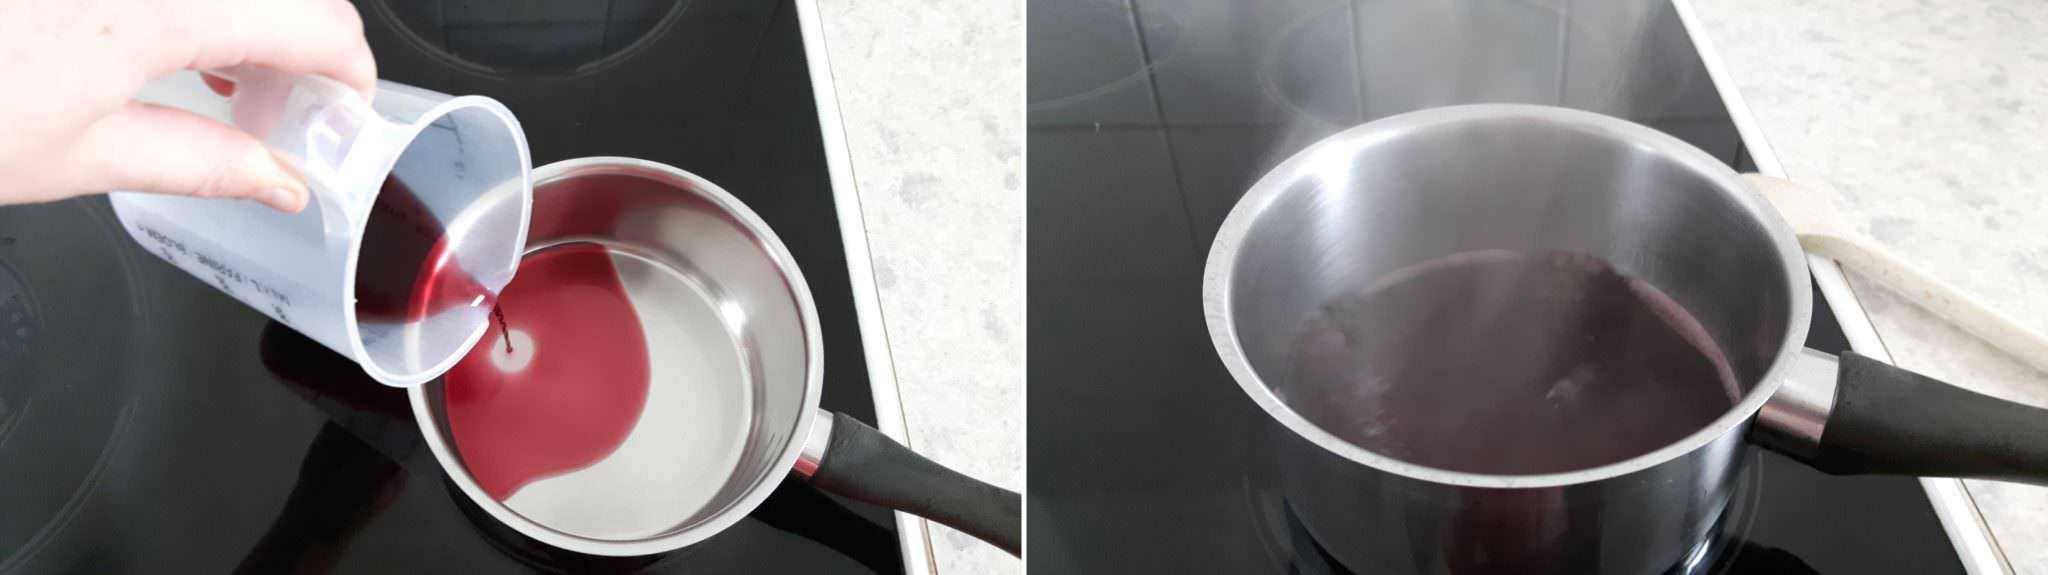 Teppanyaki Grillsoße Schritt 2 Wein kochen